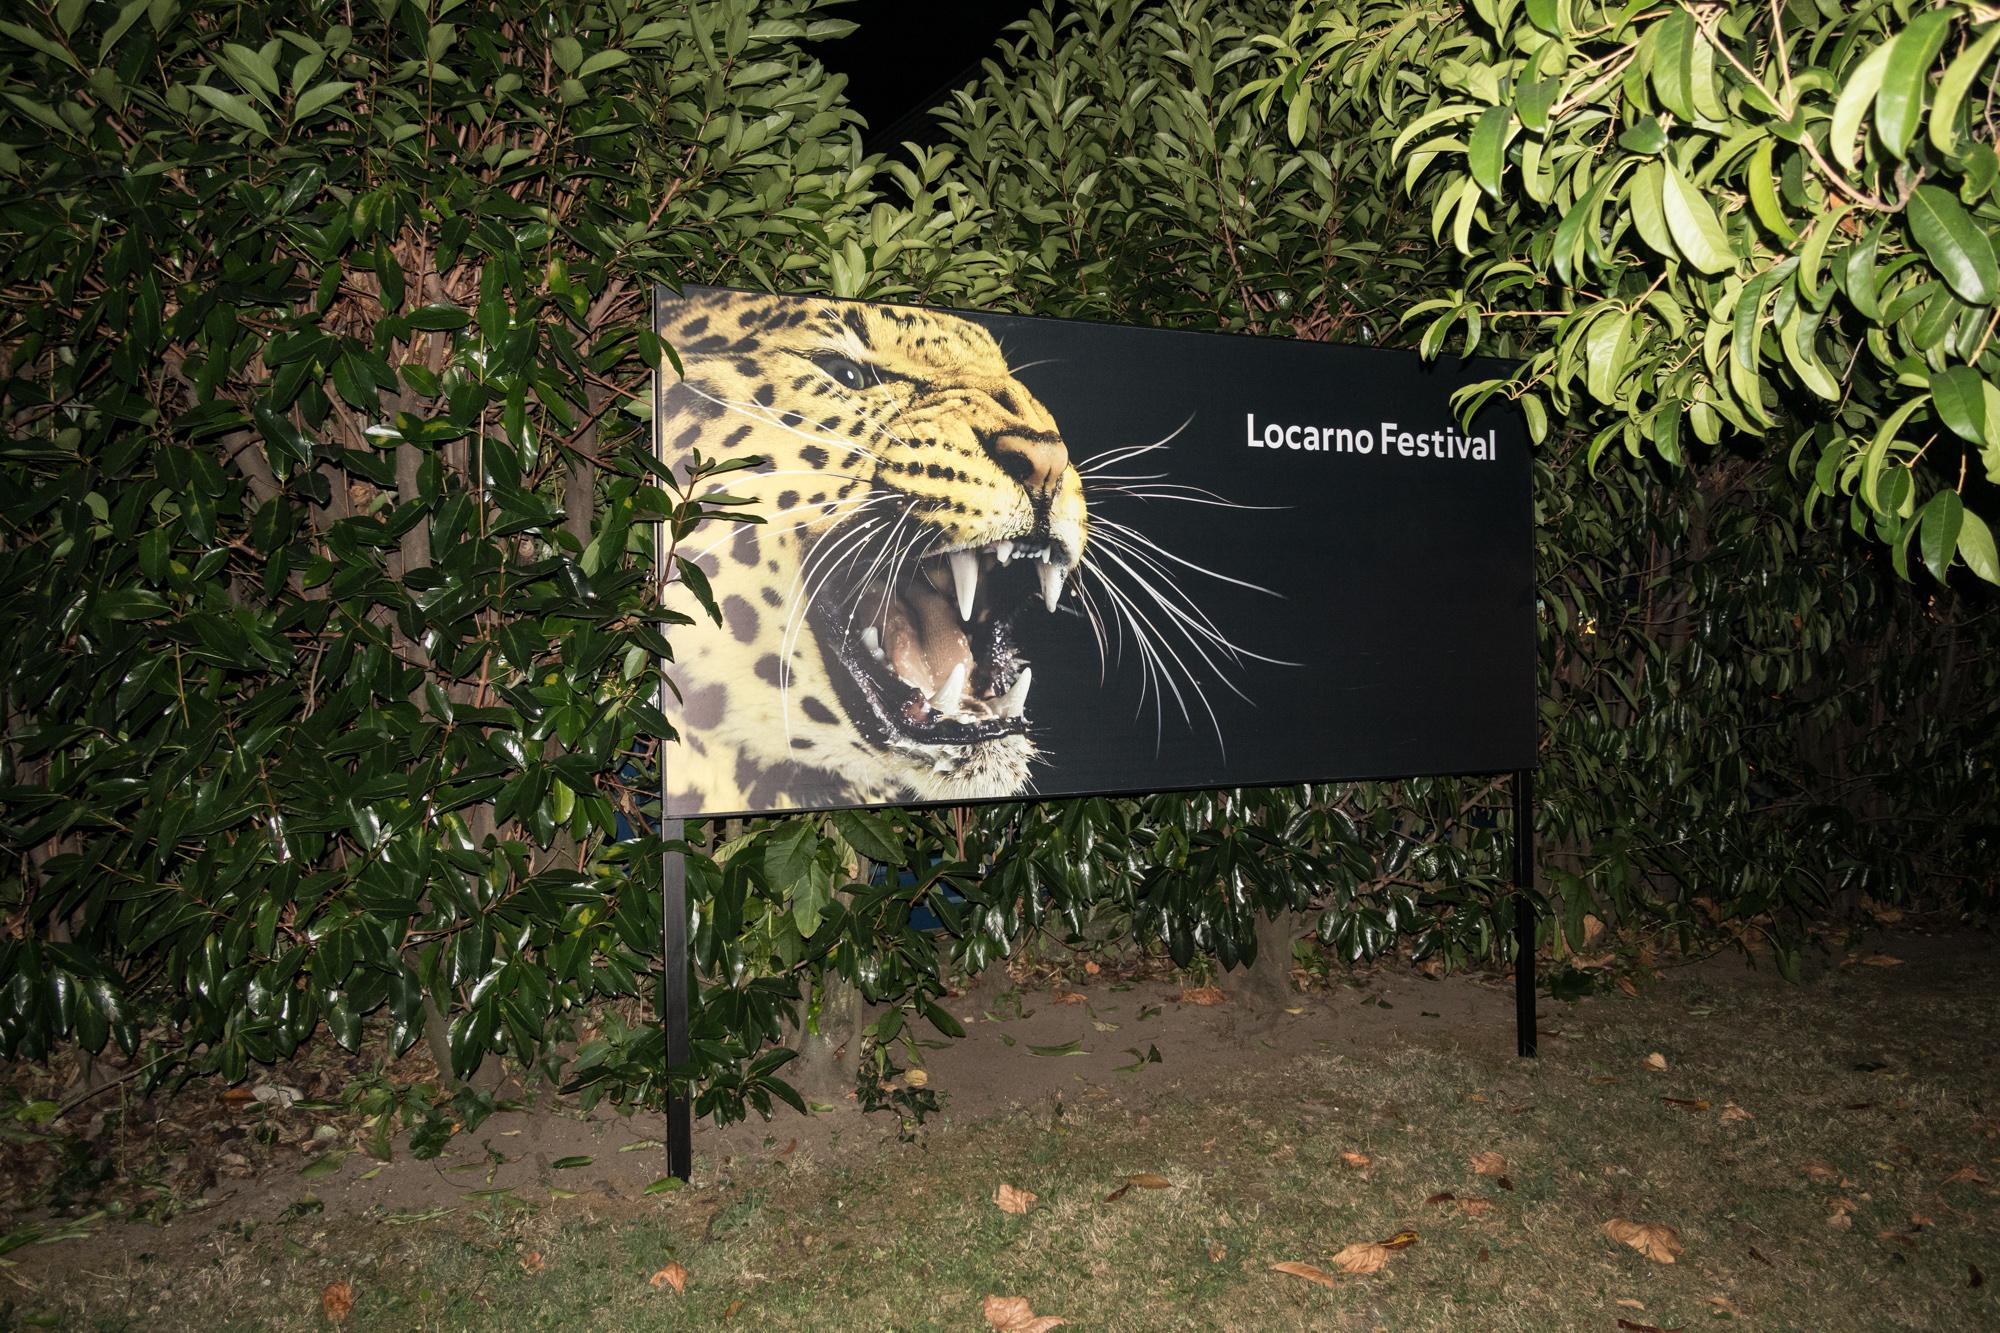 Festival-international-du-film-de-Locarno-2018-foto-©-pierre-yves-massot-4